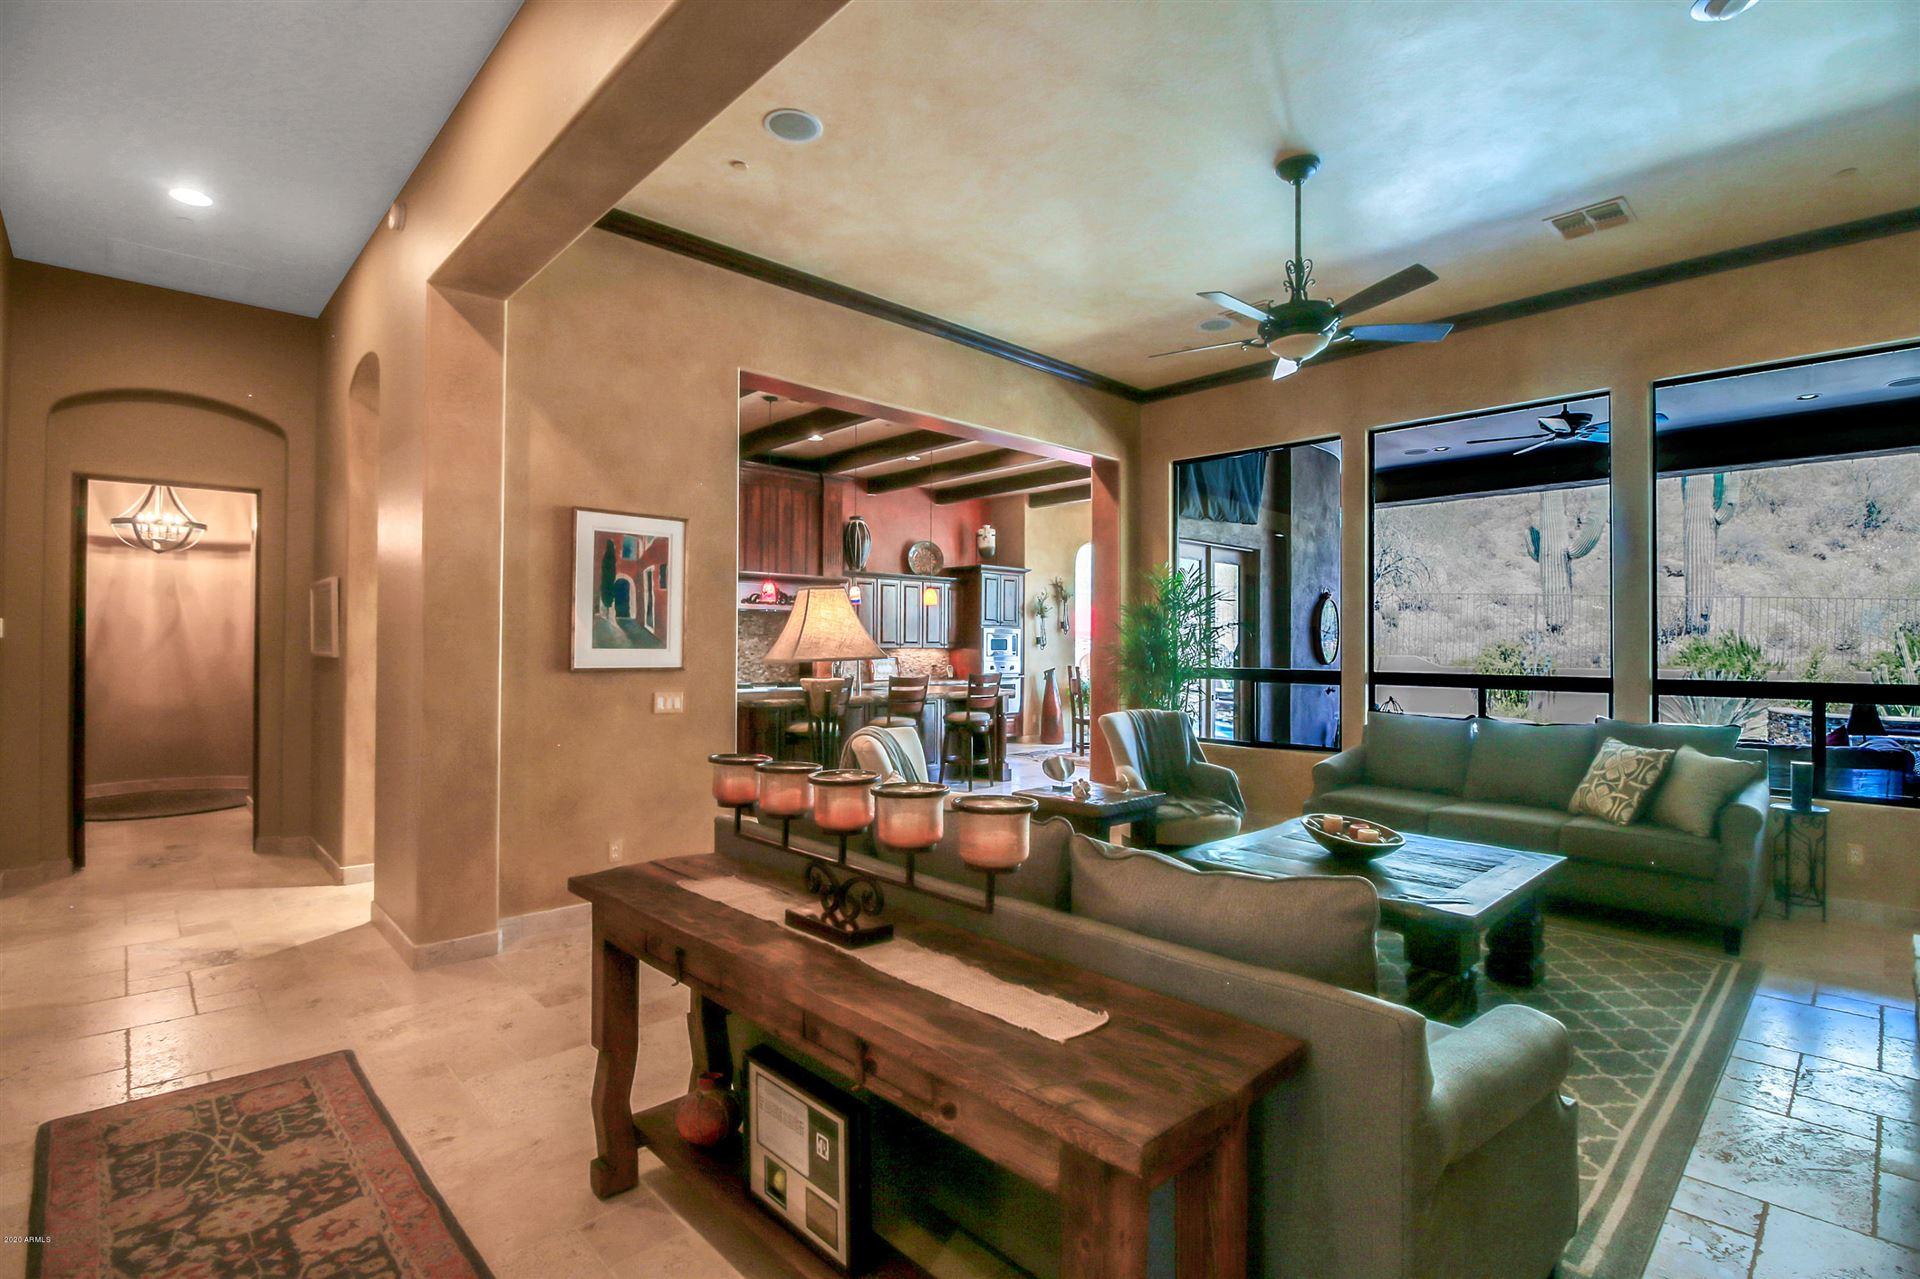 8527 E Regina Circle Mesa Az 85207 Mls 6095544 Listing Information Real Living S J Fowler Real Estate Real Living Real Estate